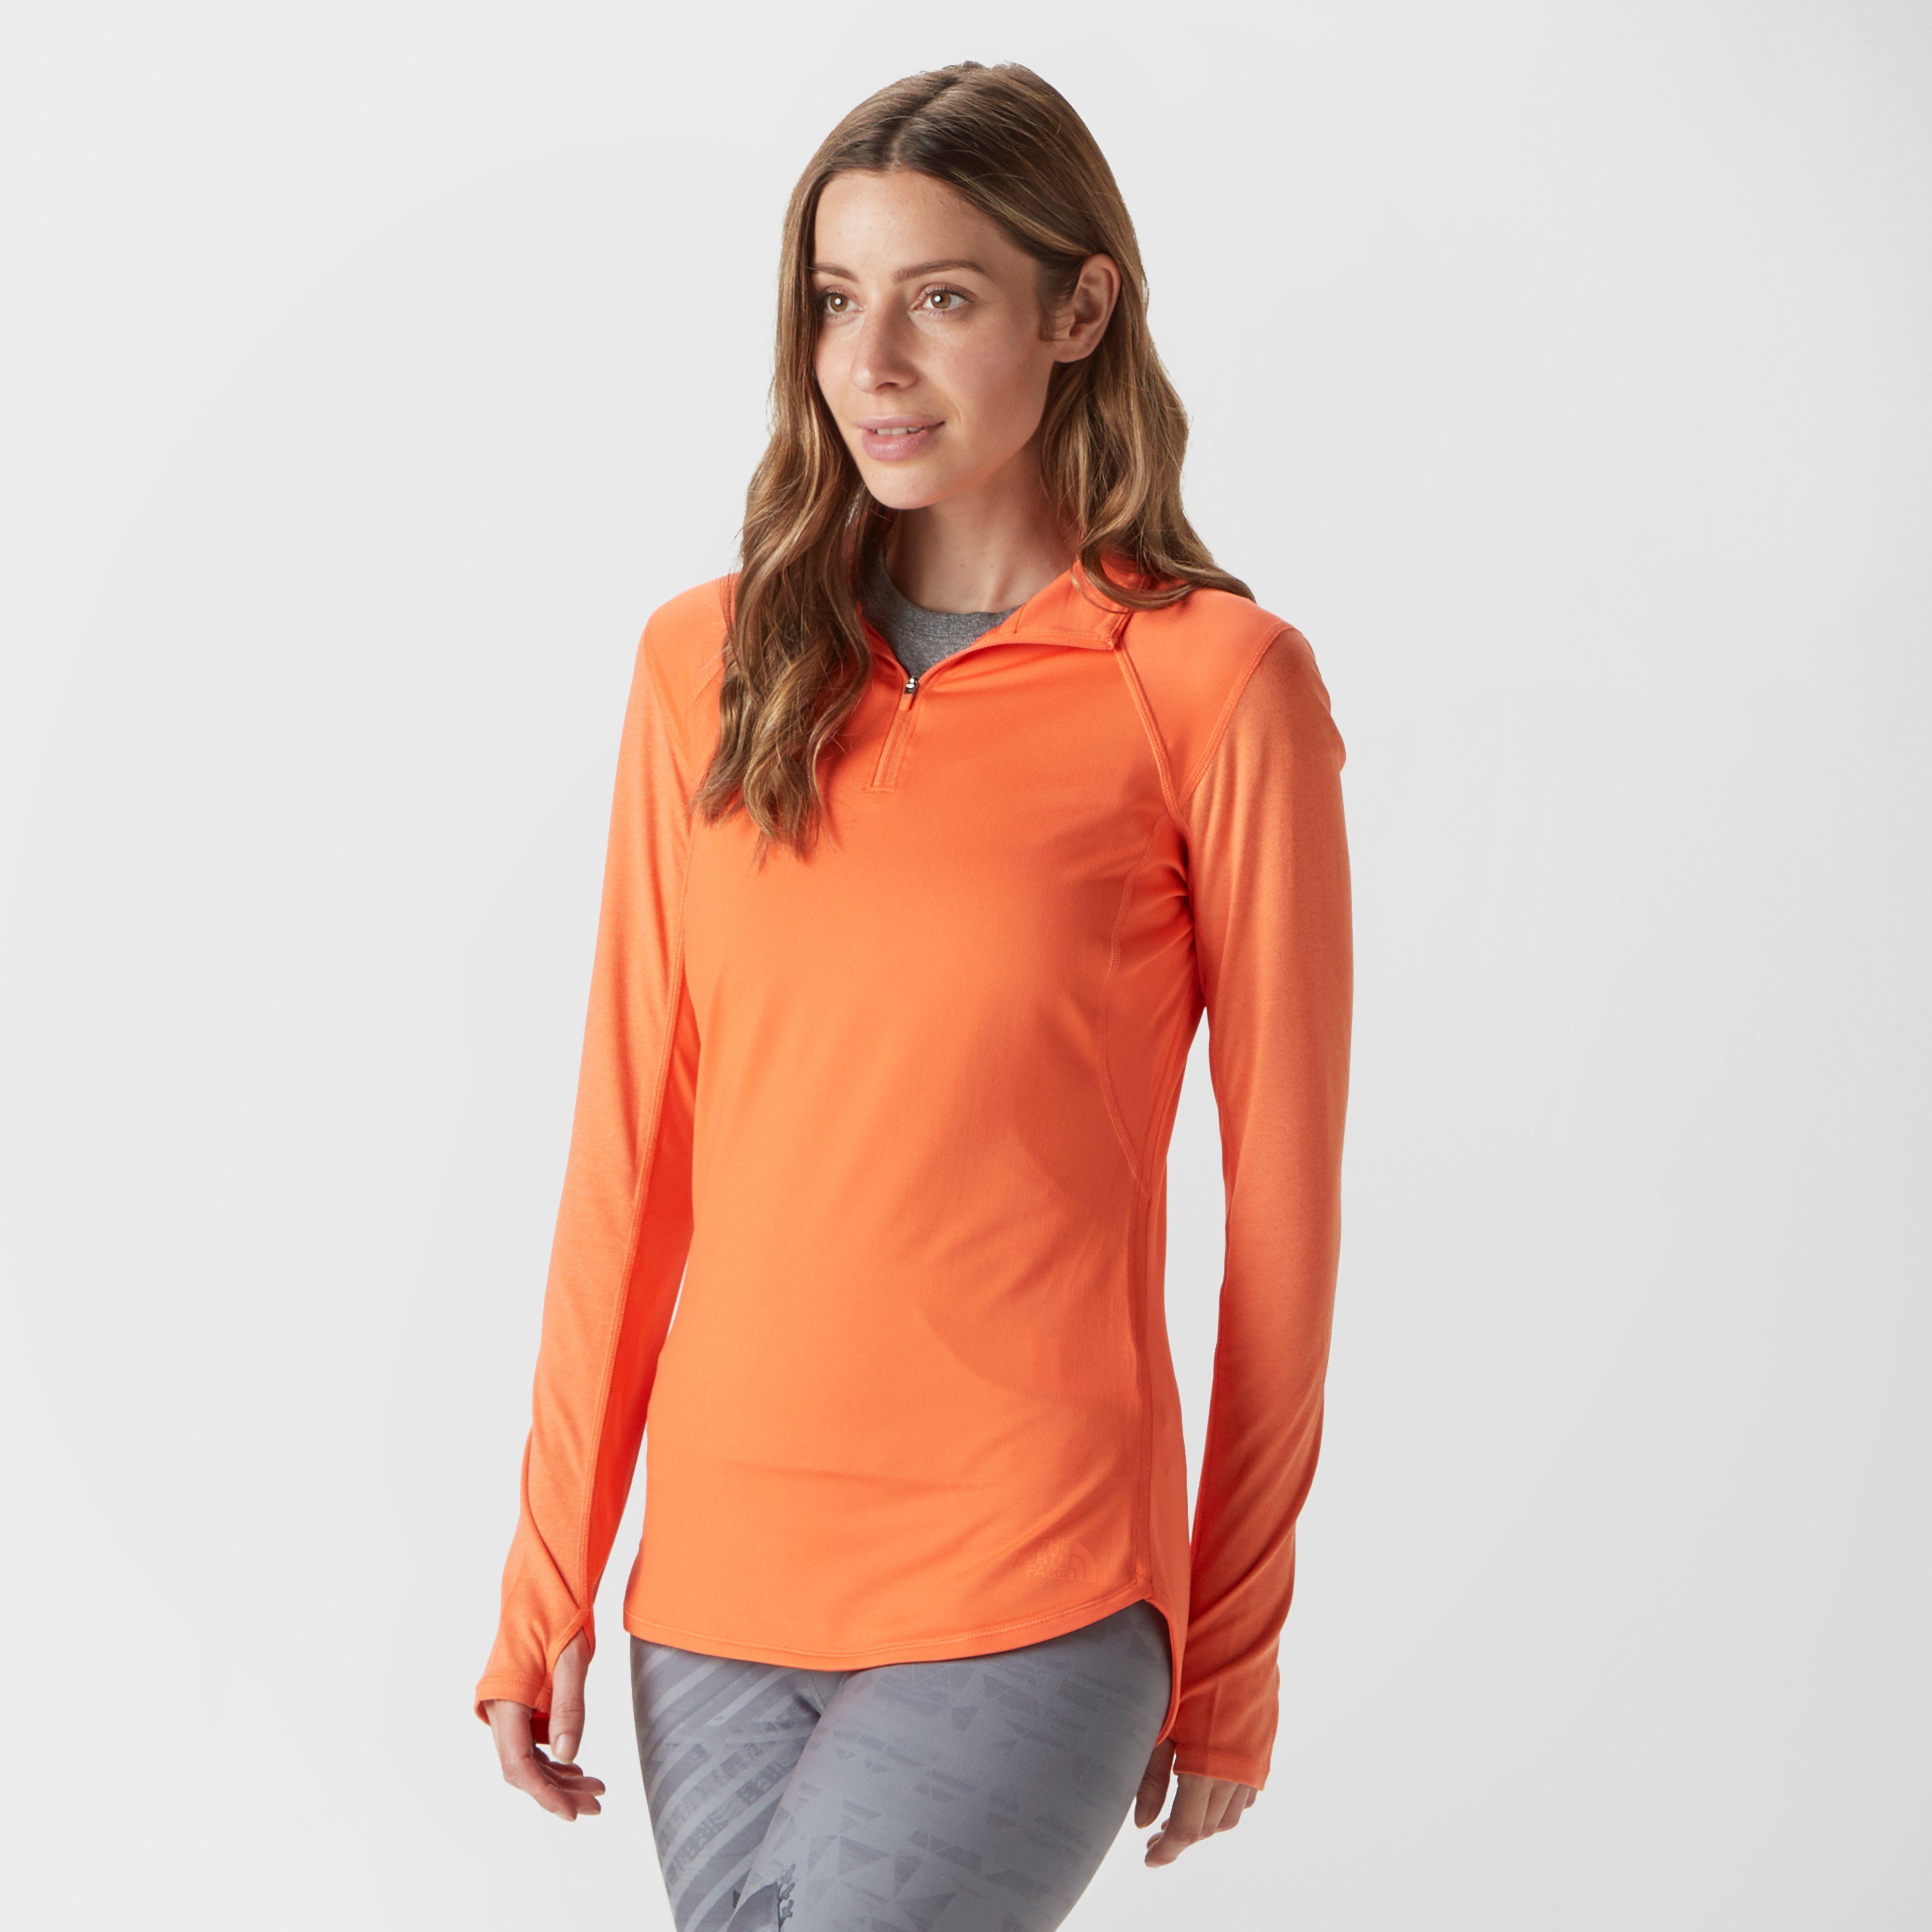 THE NORTH FACE Women's Mountain Athletics Motivation Quarter Zip Fleece